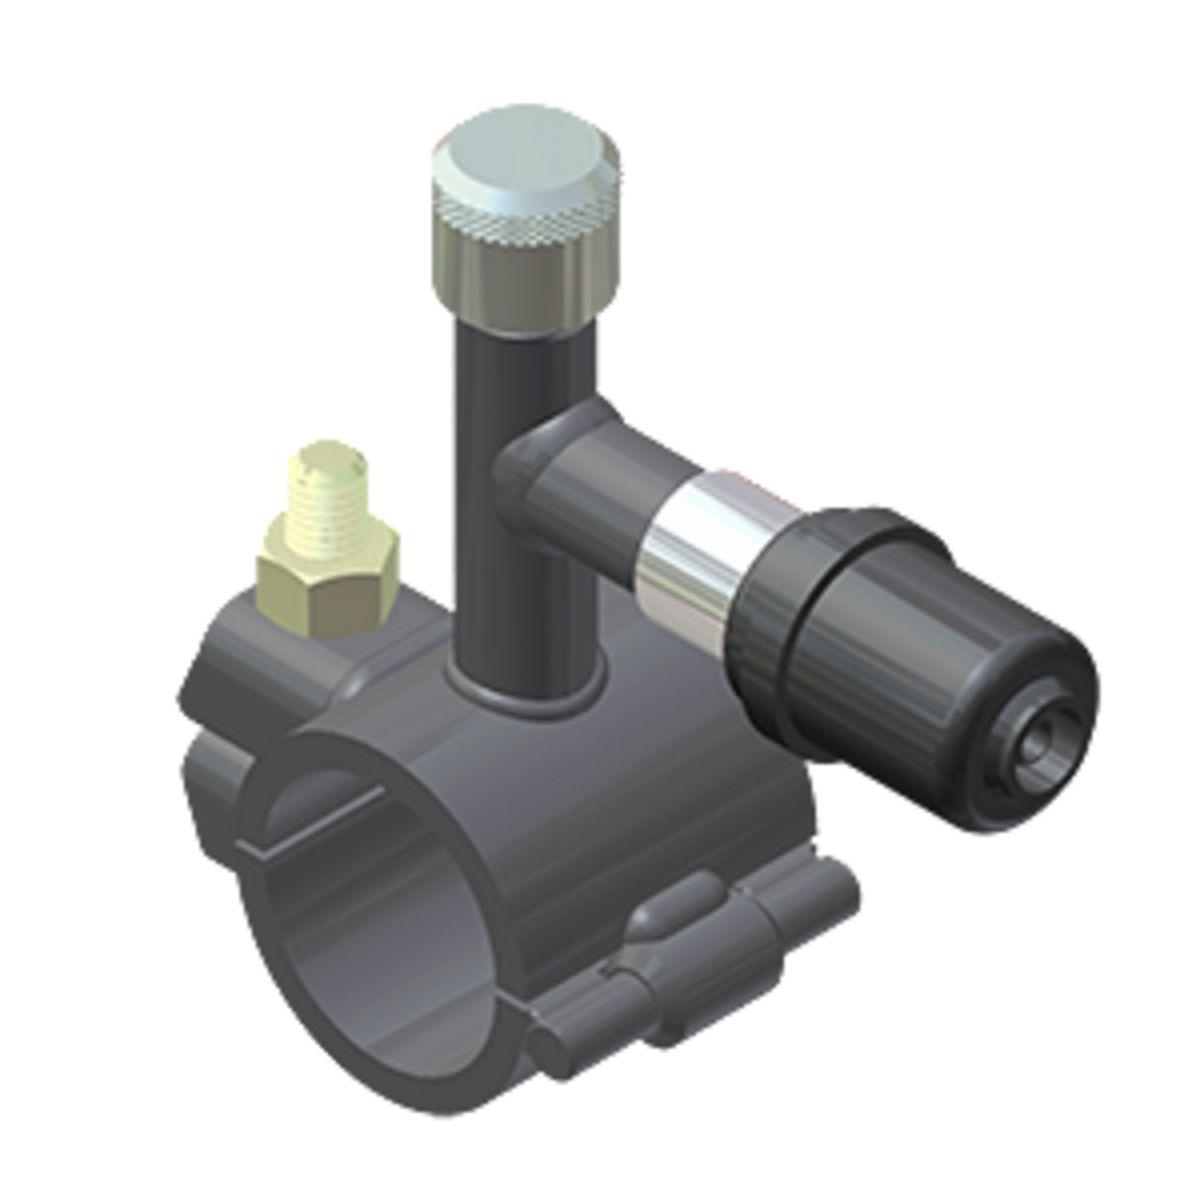 Continental ContiTech 20352995 TL3535 x 3-1//4 Taper Lock Bushing Continetal Contitech